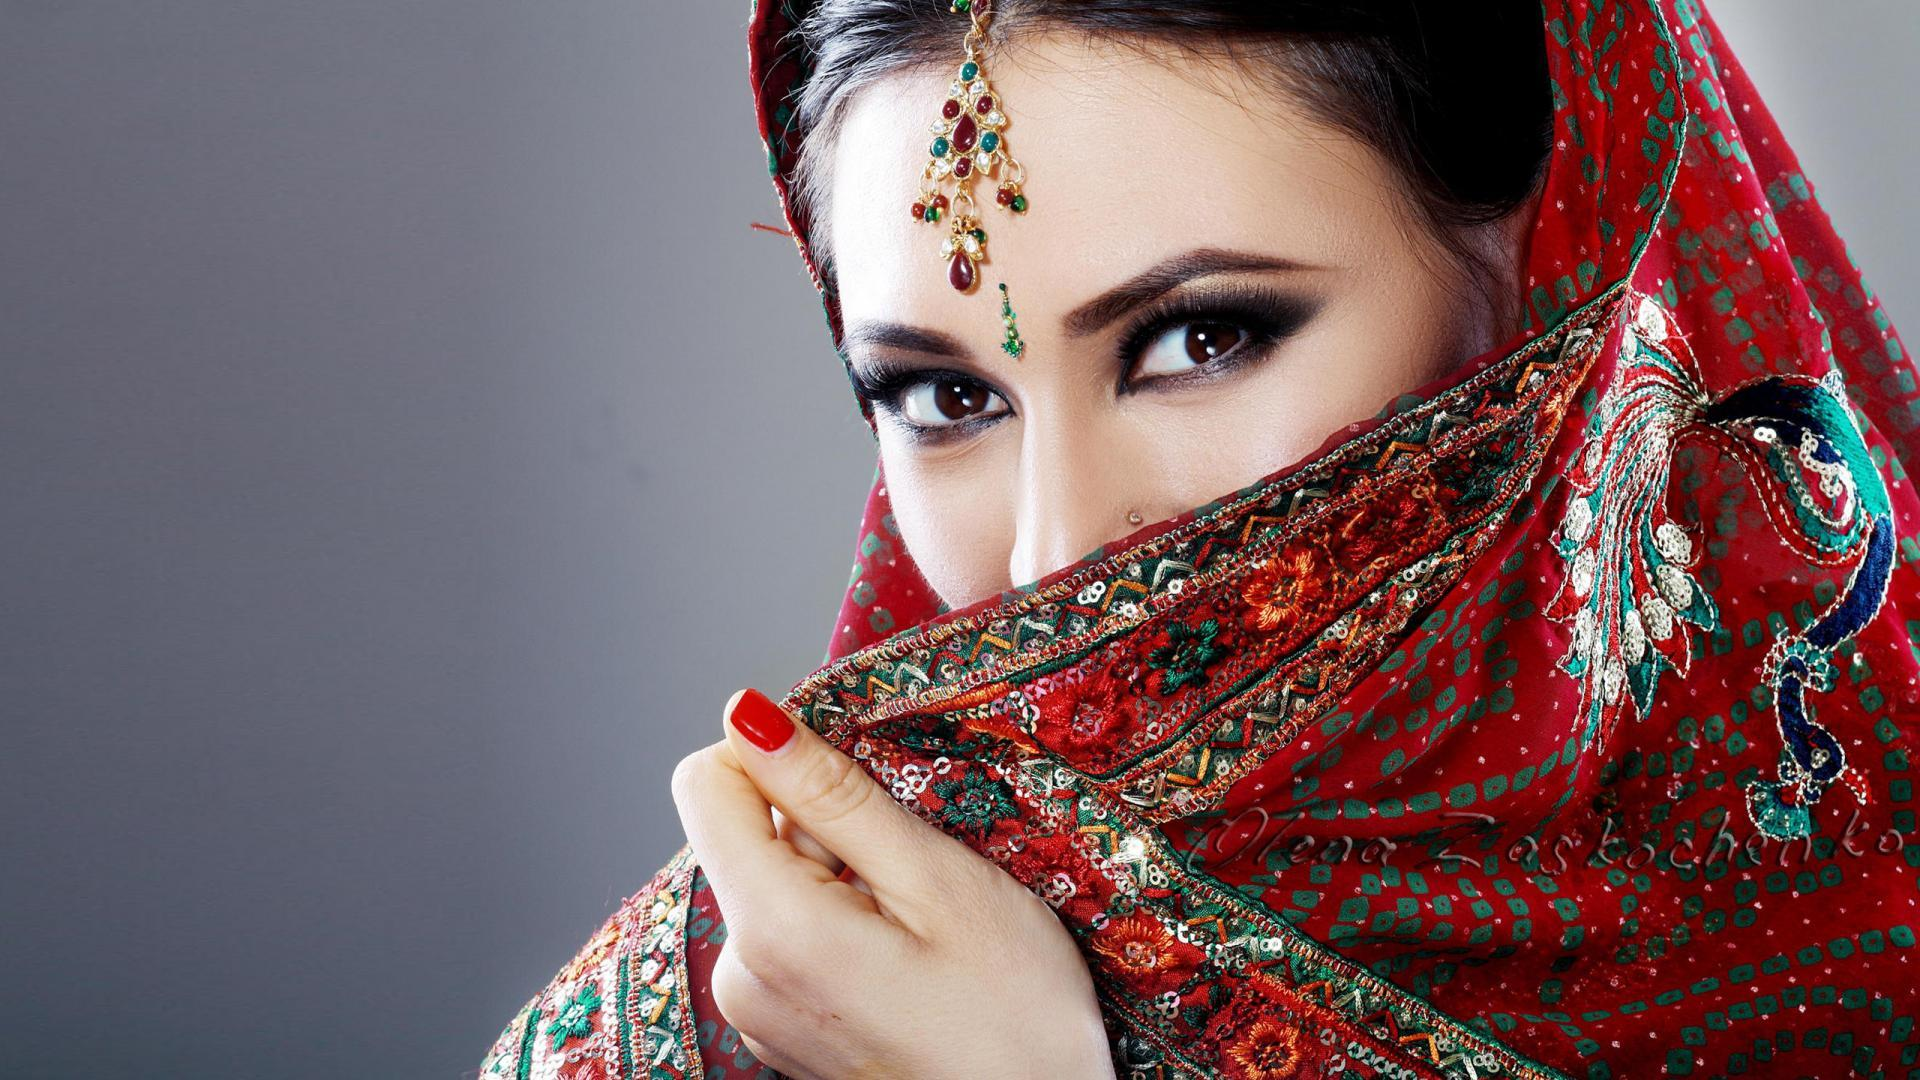 Beautiful Indian Woman Wallpapers Wallpaper Cave